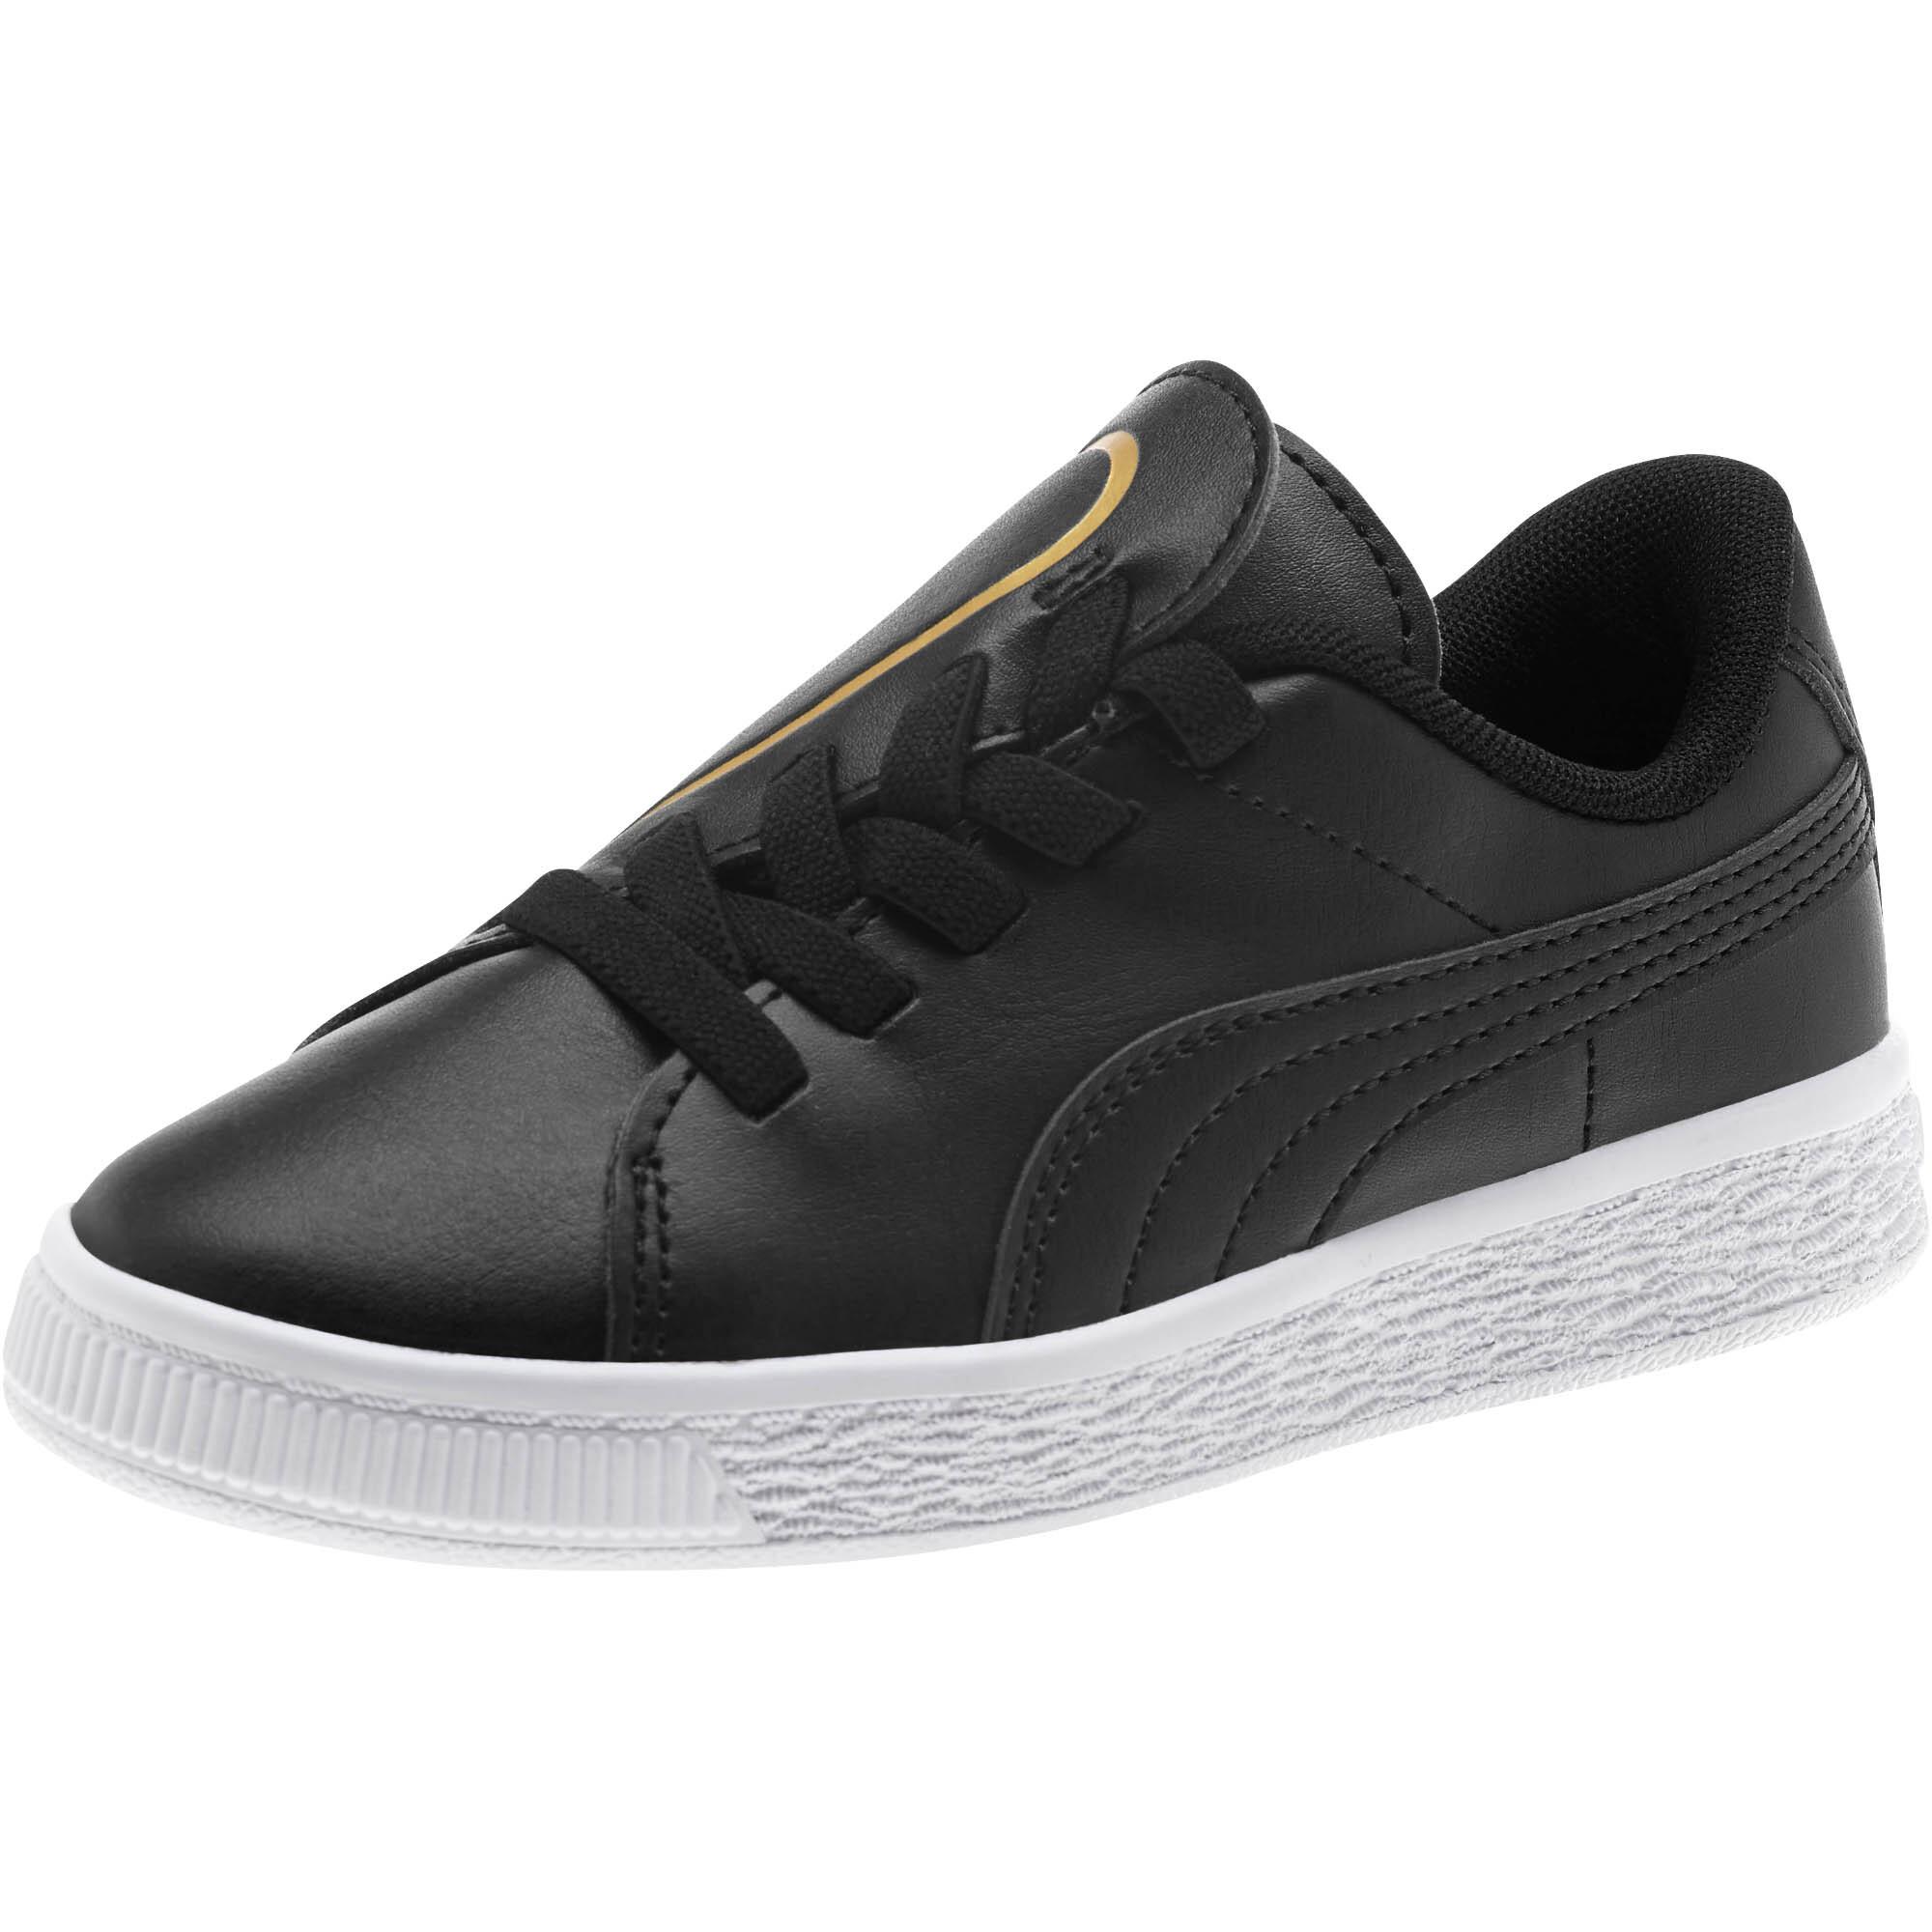 PUMA-Basket-Crush-AC-Little-Kids-039-Shoes-Girls-Shoe-Kids thumbnail 4